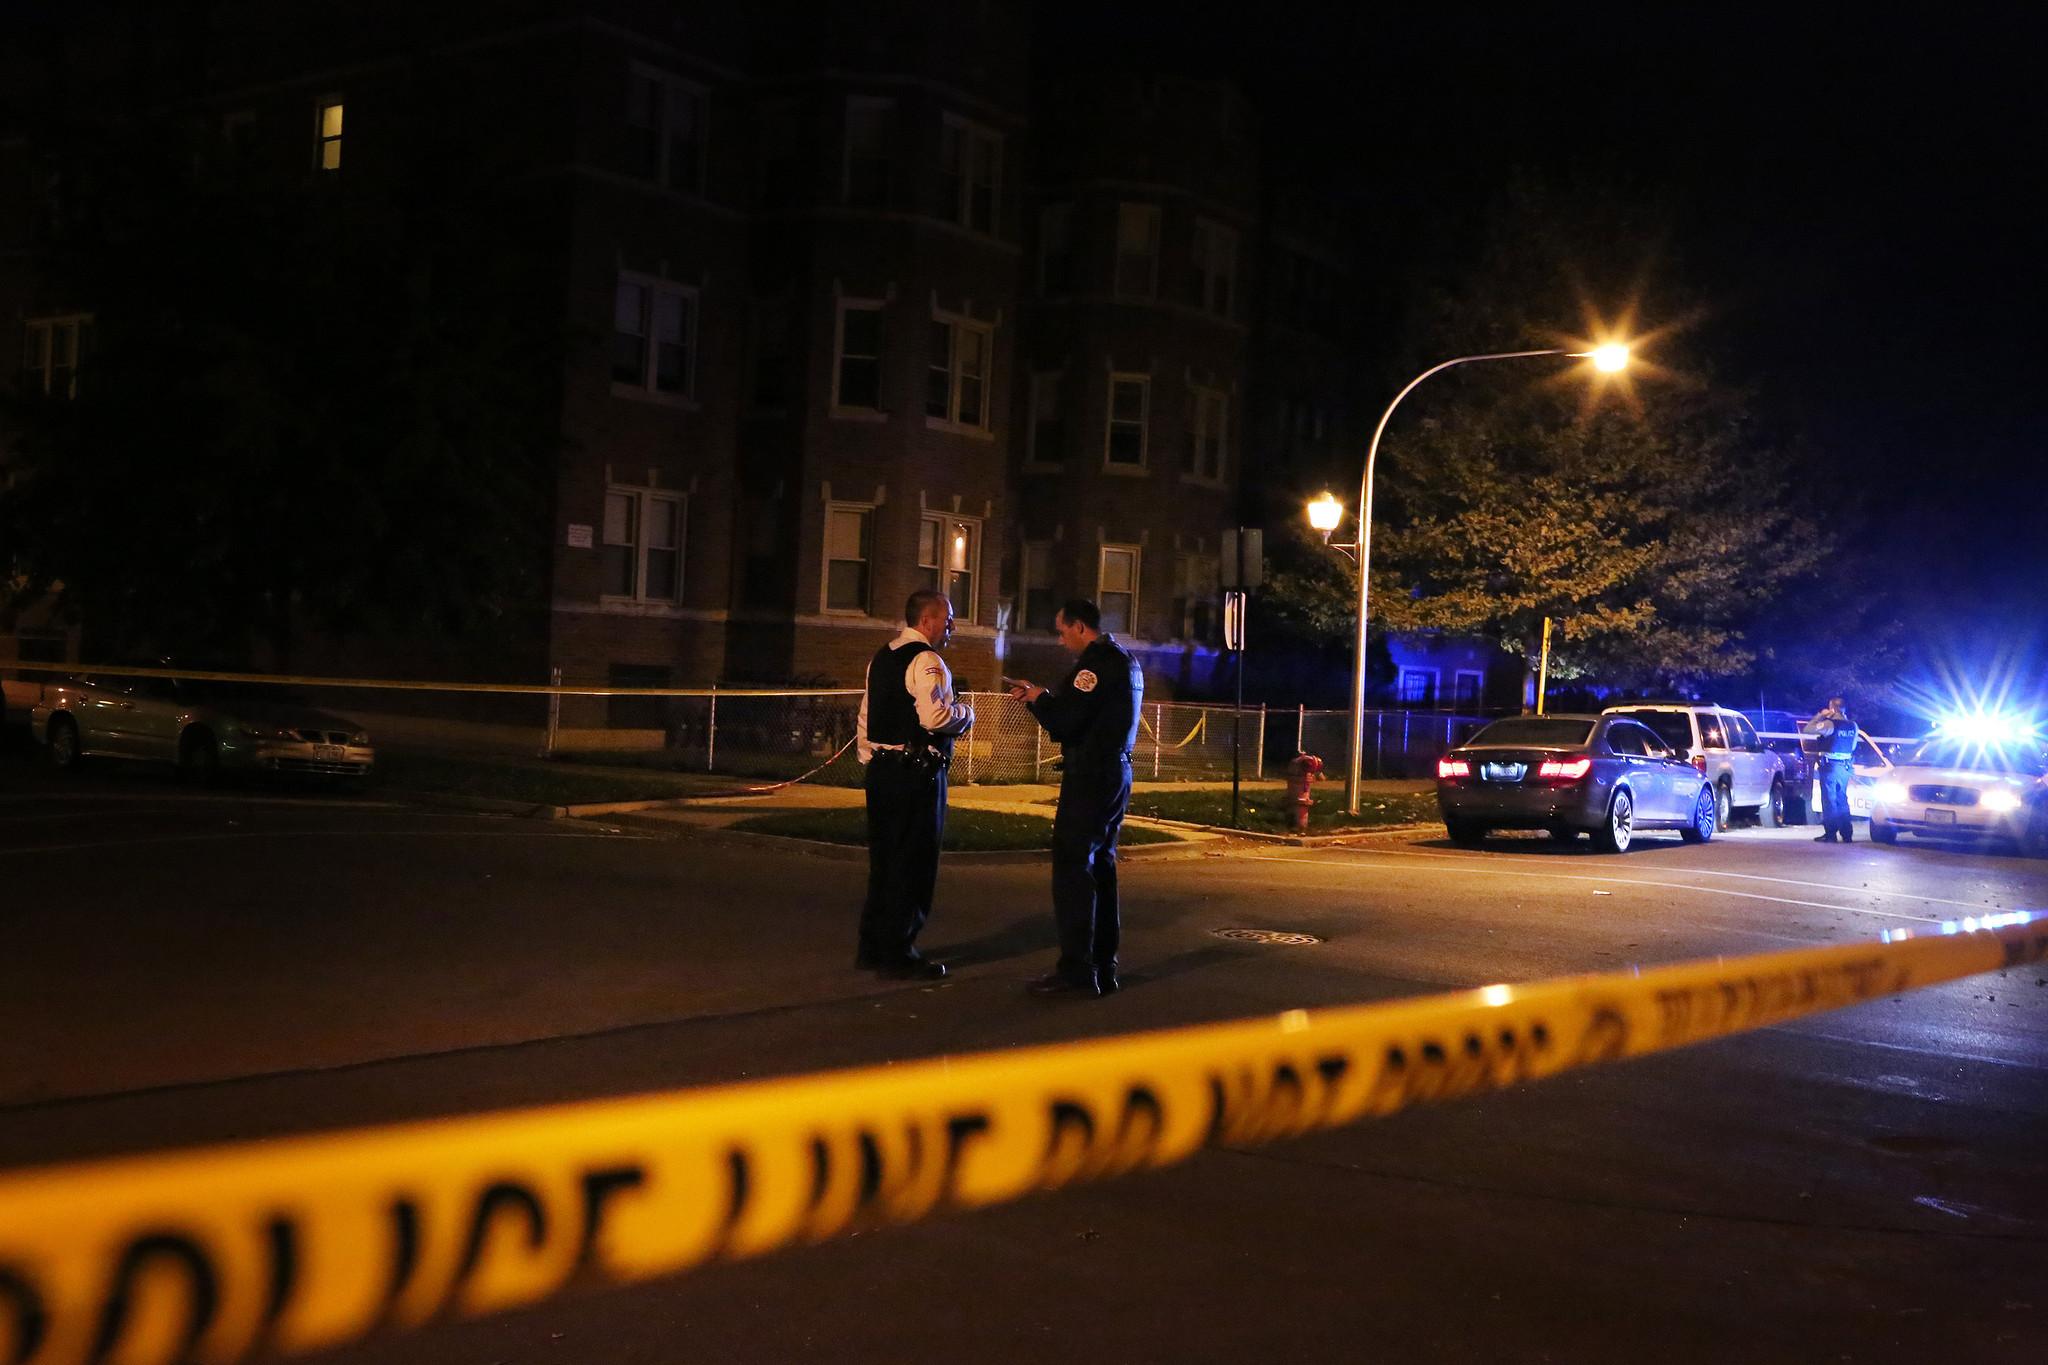 15 hurt in shootings since saturday chicago tribune